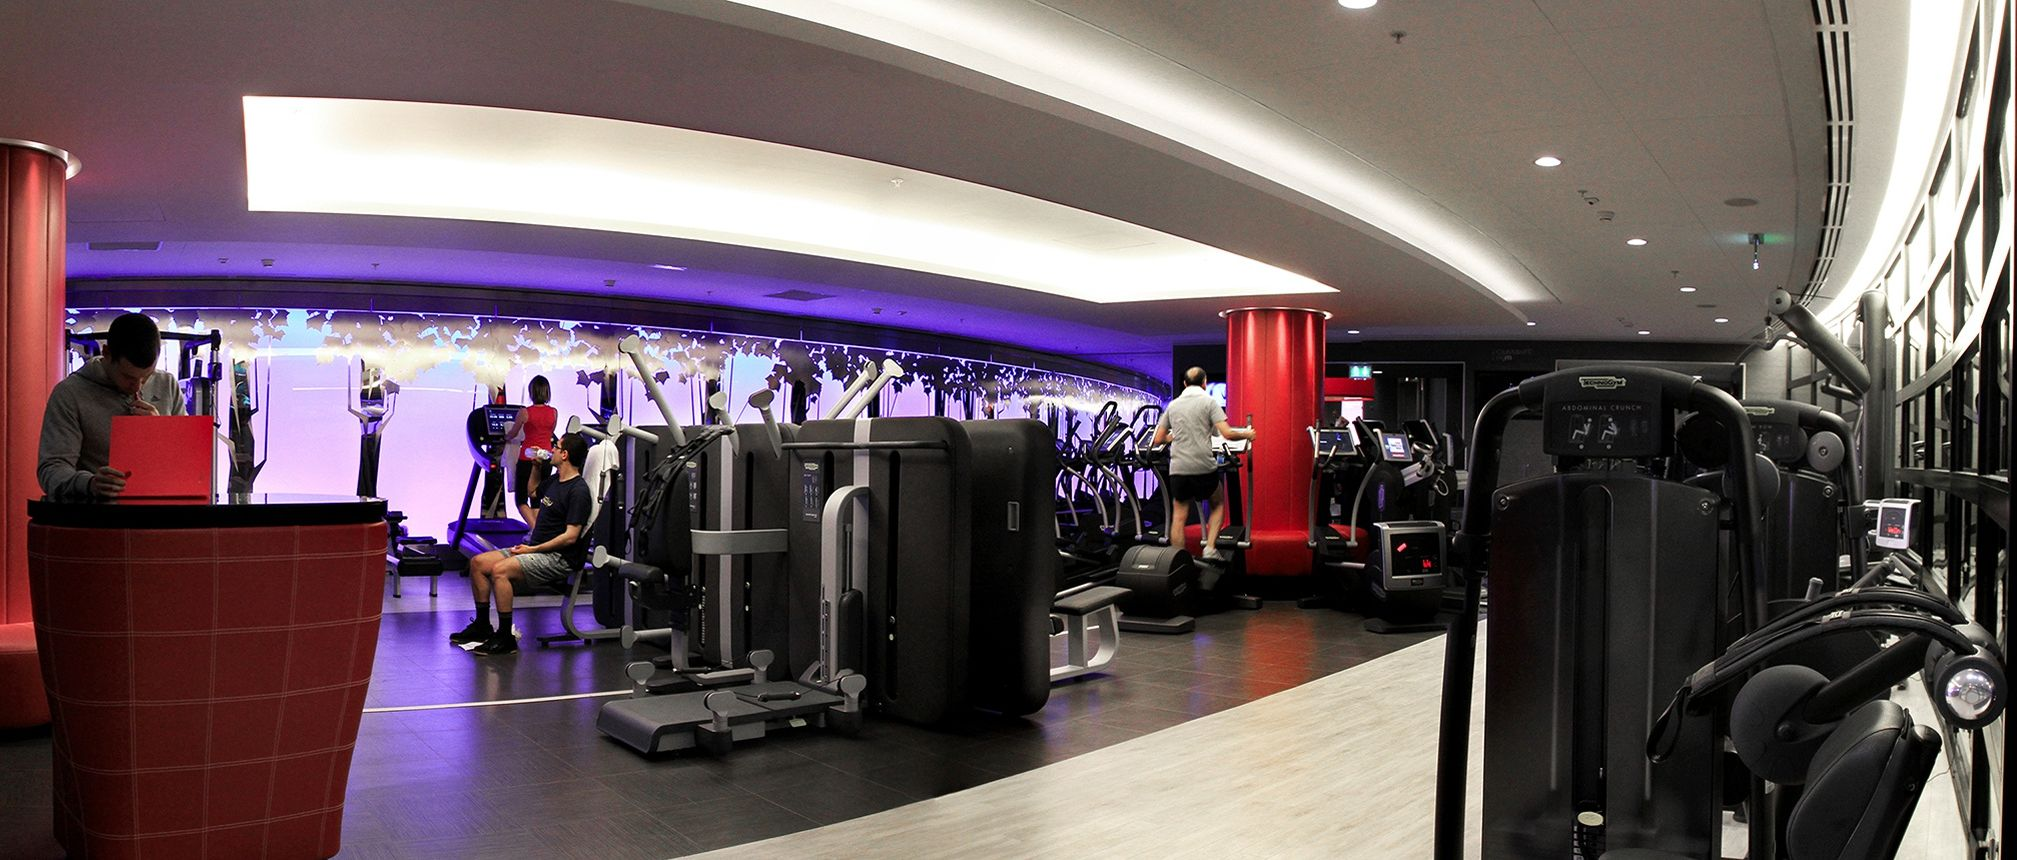 le propri taire de dalloyau lorgne l 39 ex club med gym. Black Bedroom Furniture Sets. Home Design Ideas